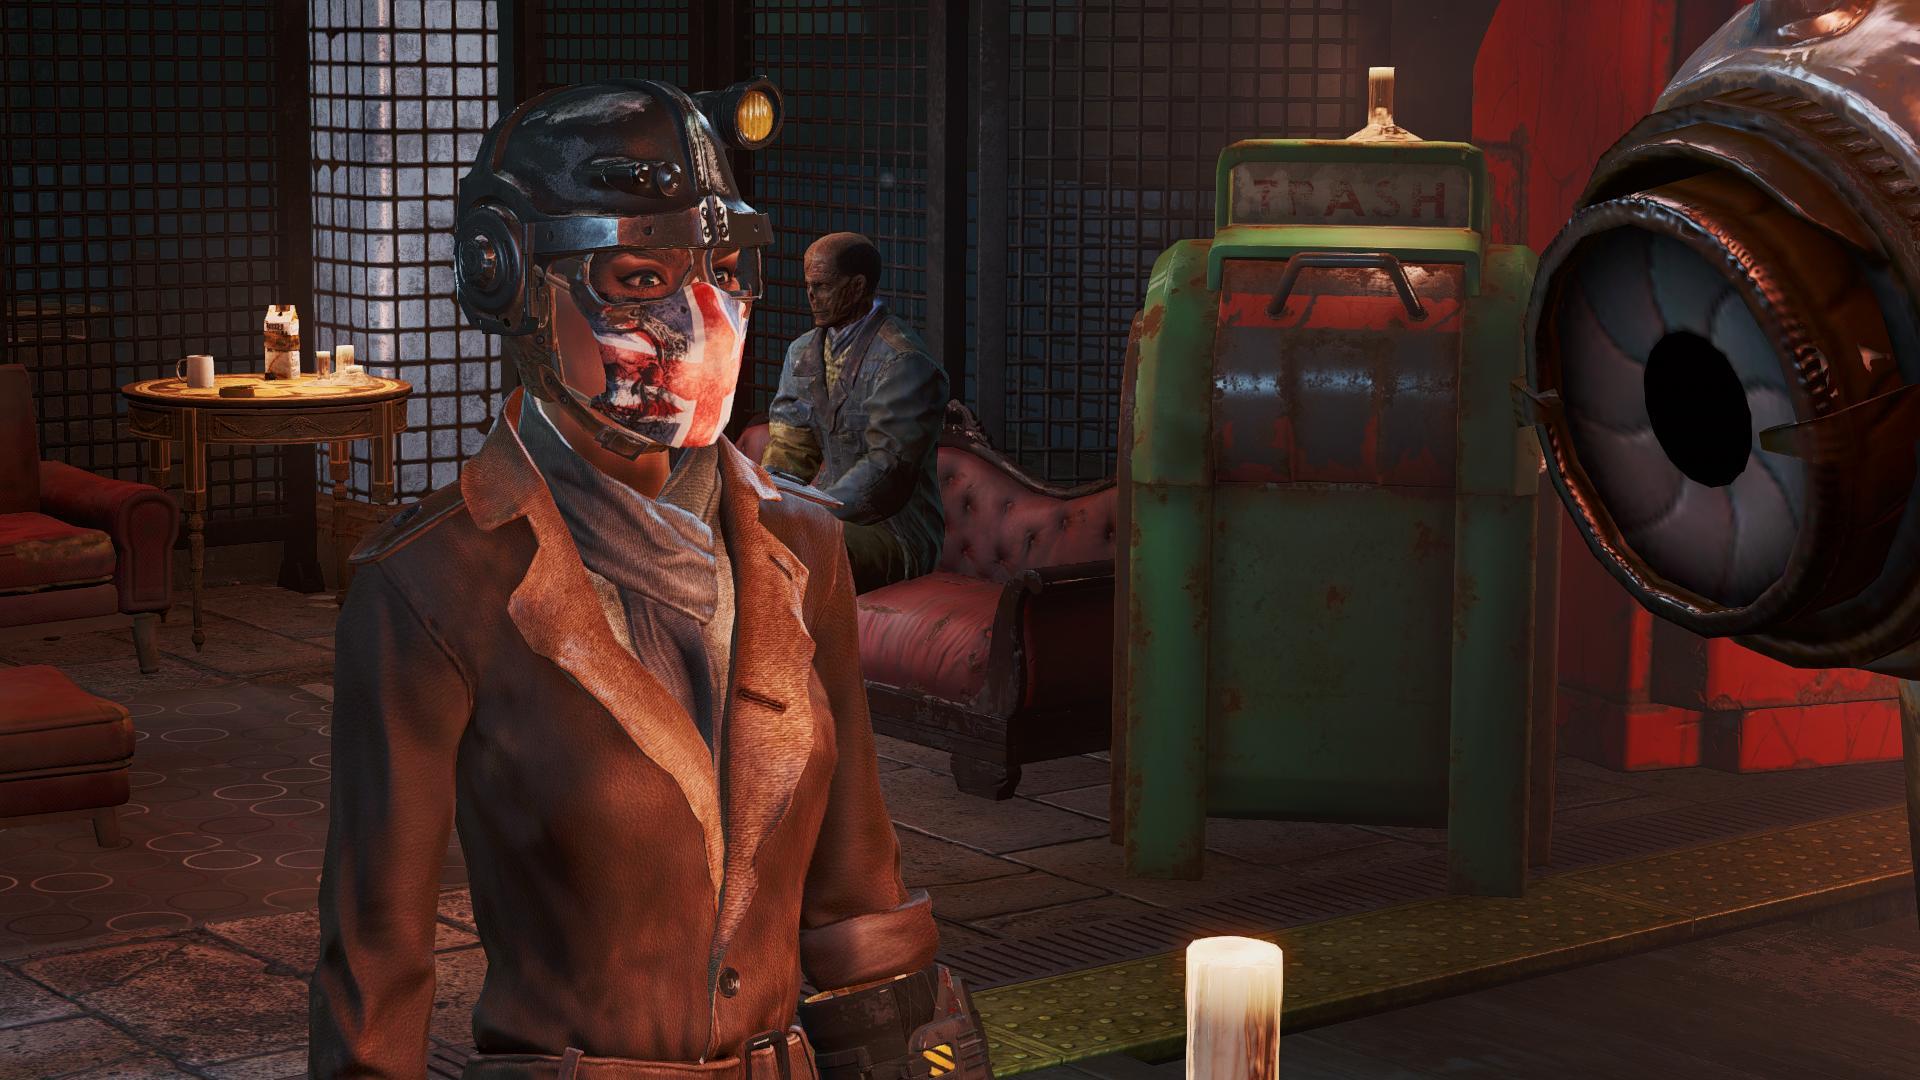 000523.Jpg - Fallout 4